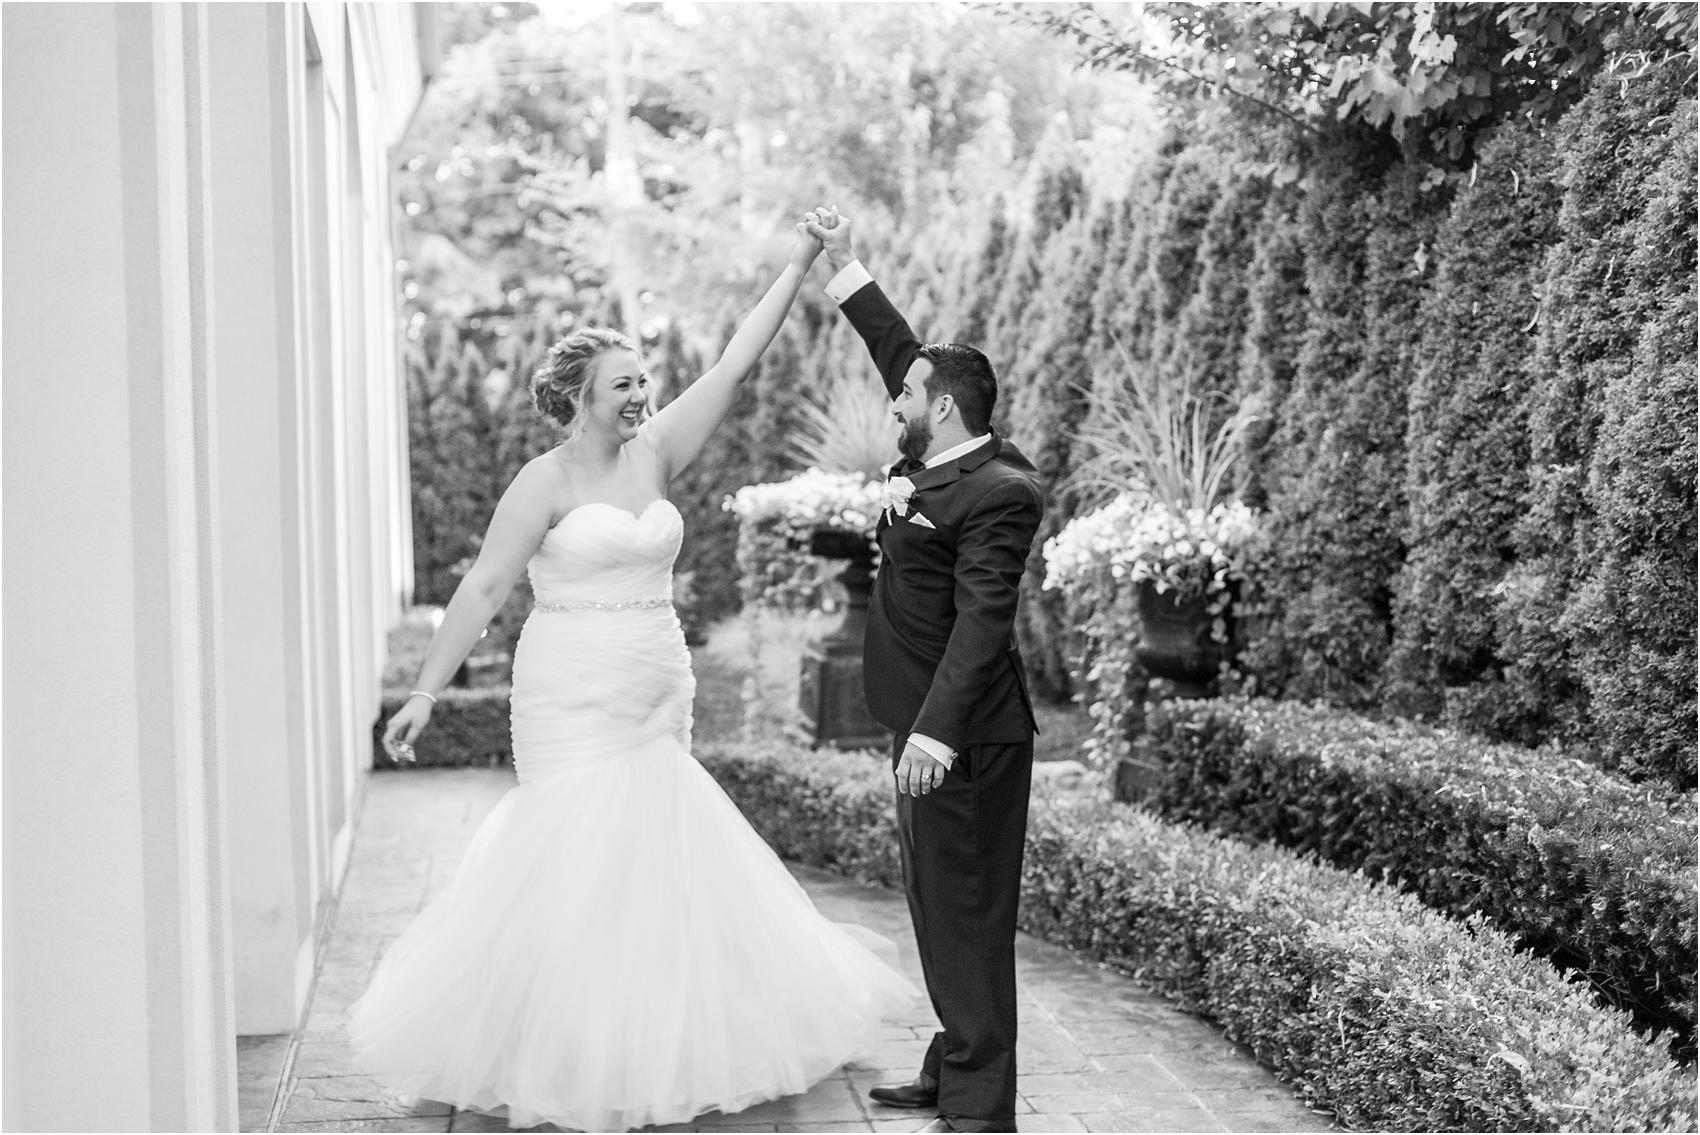 joyful-and-candid-navy-blush-wedding-photos-at-crystal-gardens-in-howell-mi-by-courtney-carolyn-photography_0110.jpg